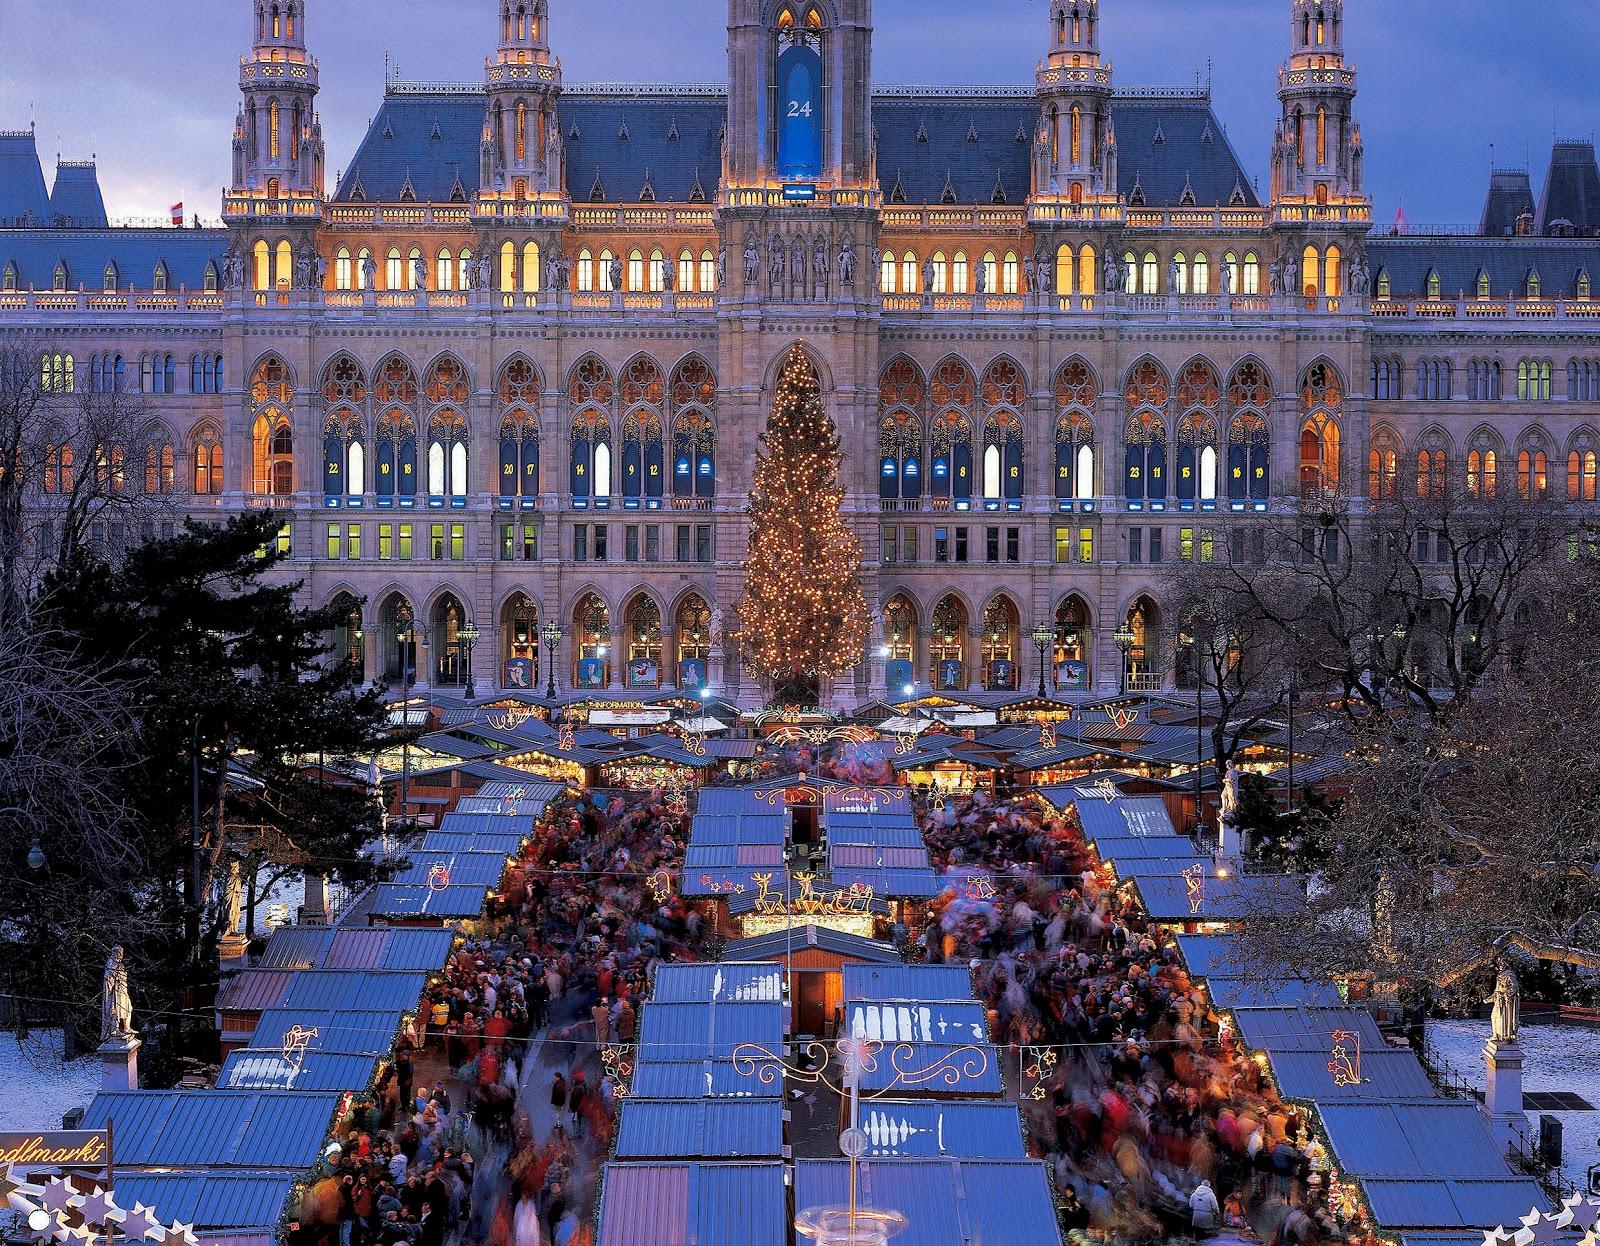 Austrija Christmas+Market+in+front+of+the+Vienna+City+Hall+(c)+Austrian+Tourist+Office